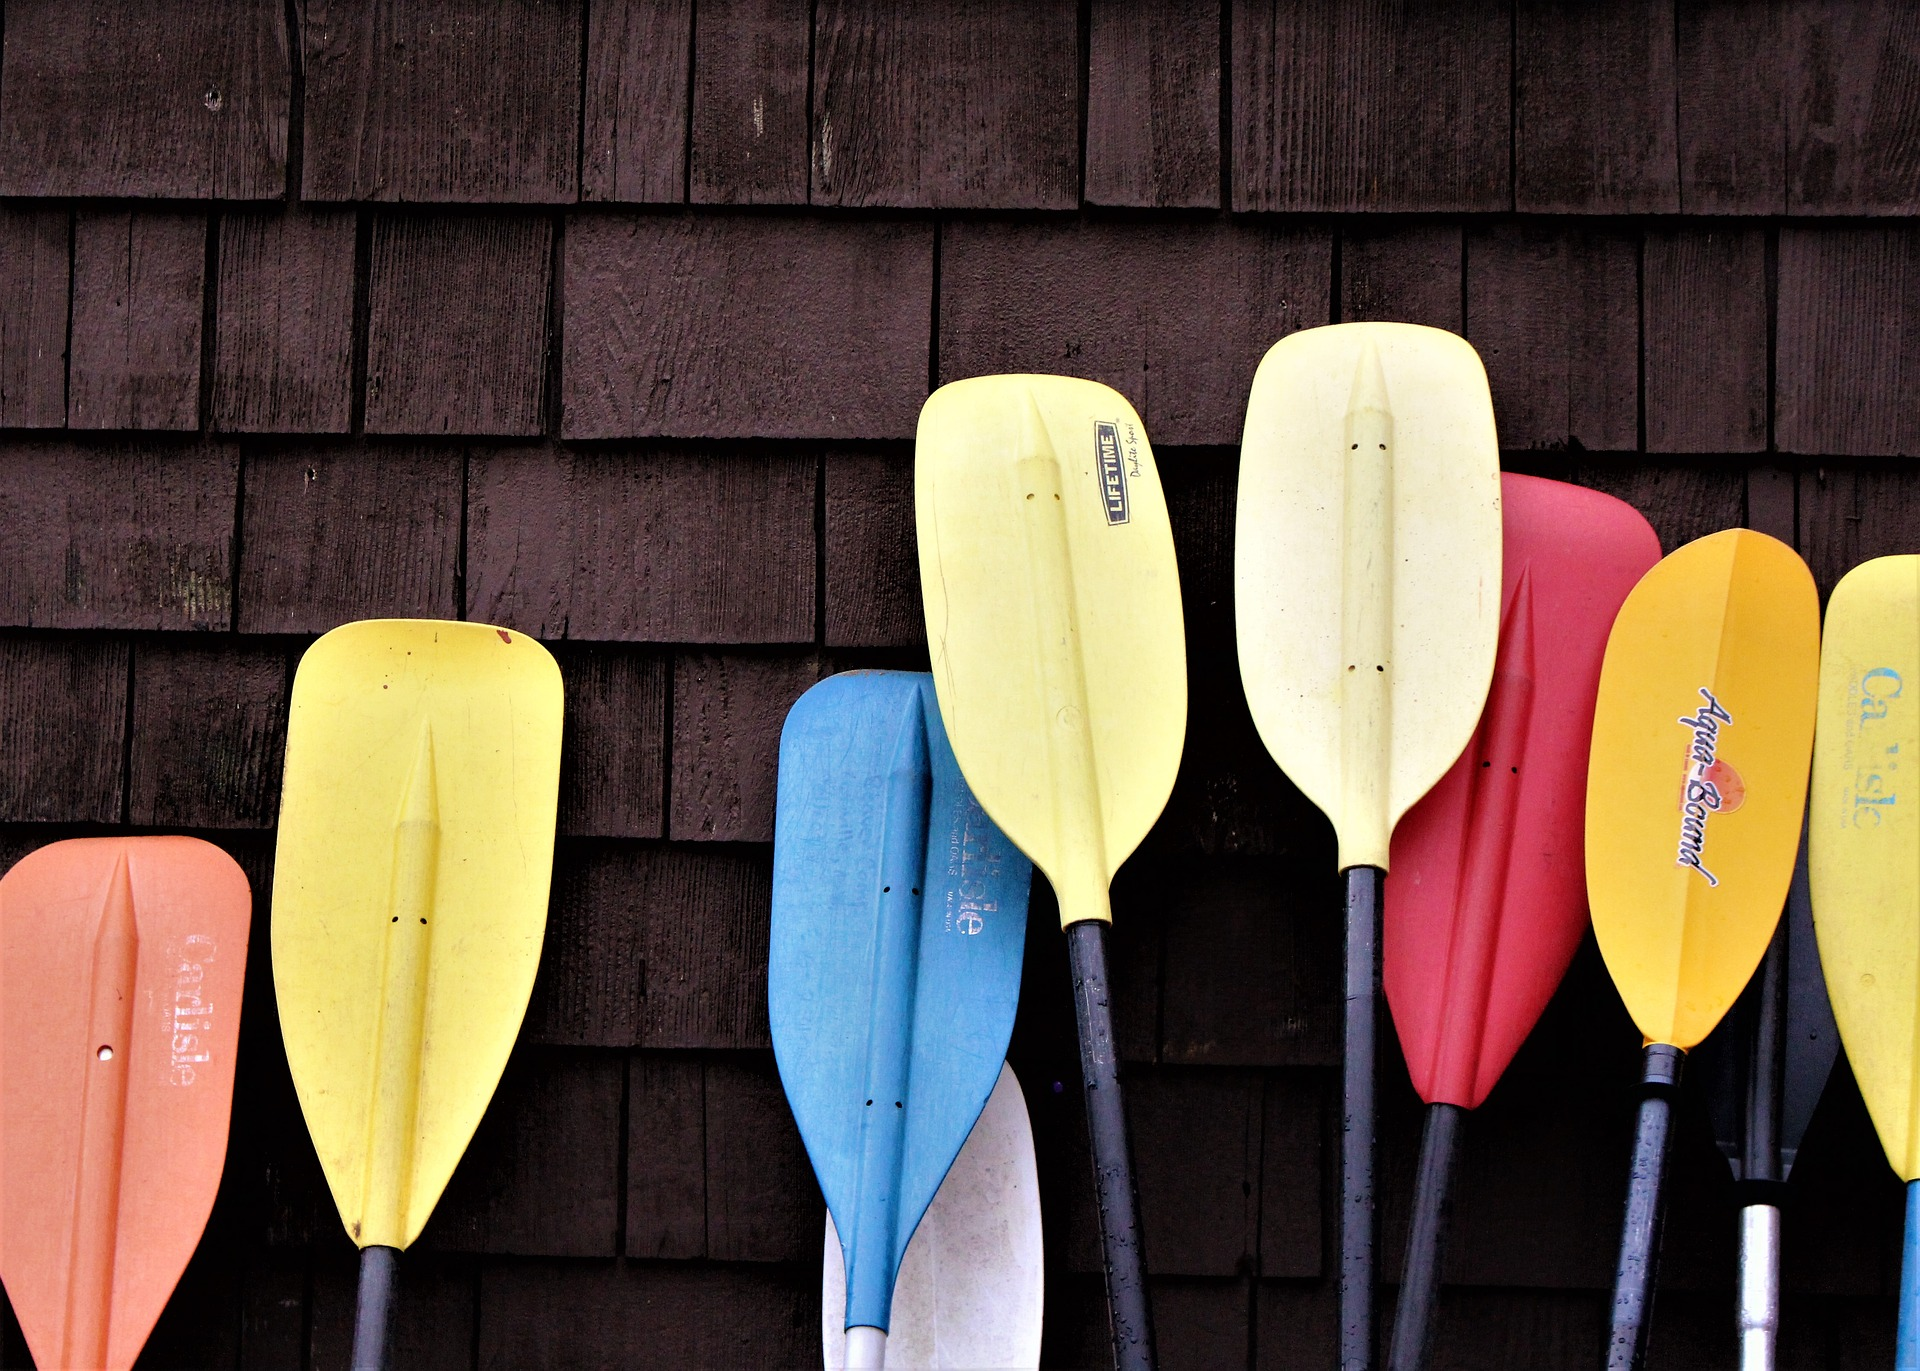 kayak paddles against cabin